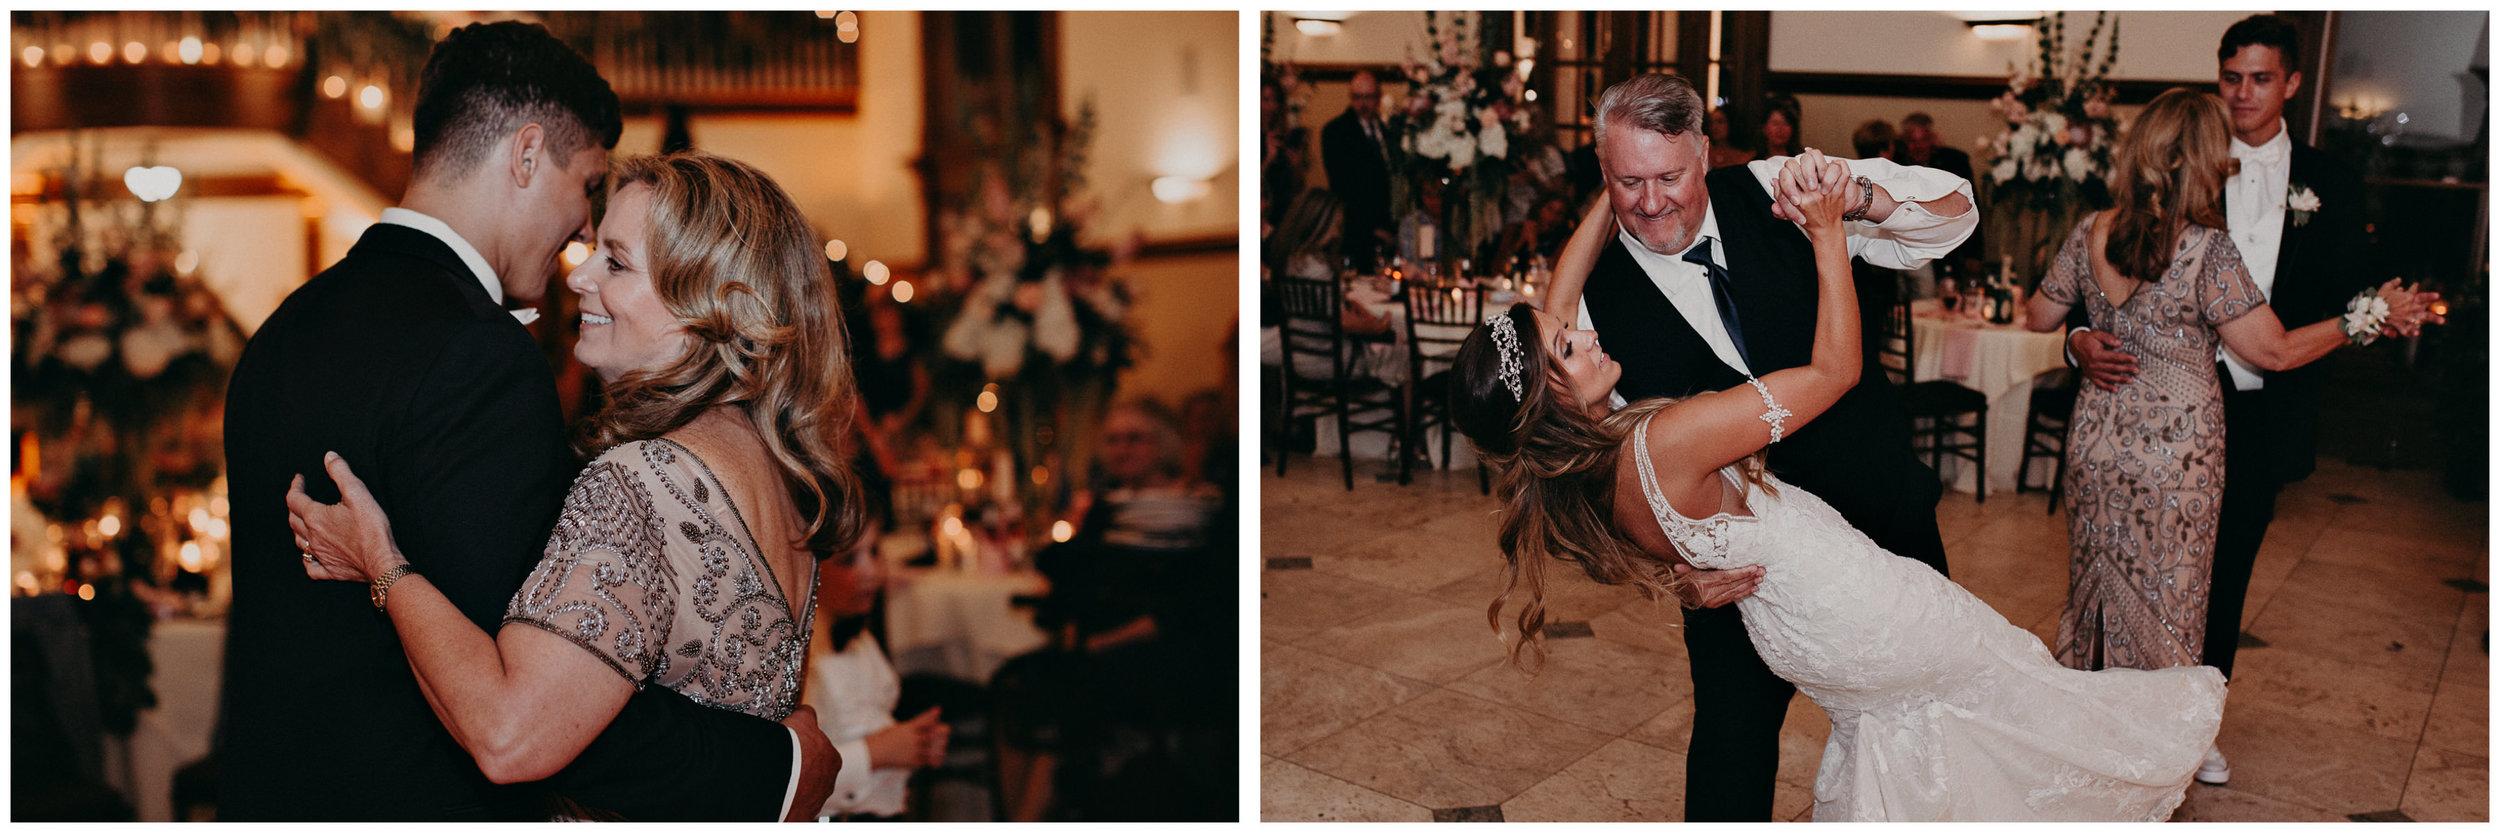 93Carl House Wedding Venue Ga, Atlanta Wedding Photographer - Boho, Bohemian, Junebug Weddings, Vintage, Retro, Trendy. Aline Marin Photography. .jpg